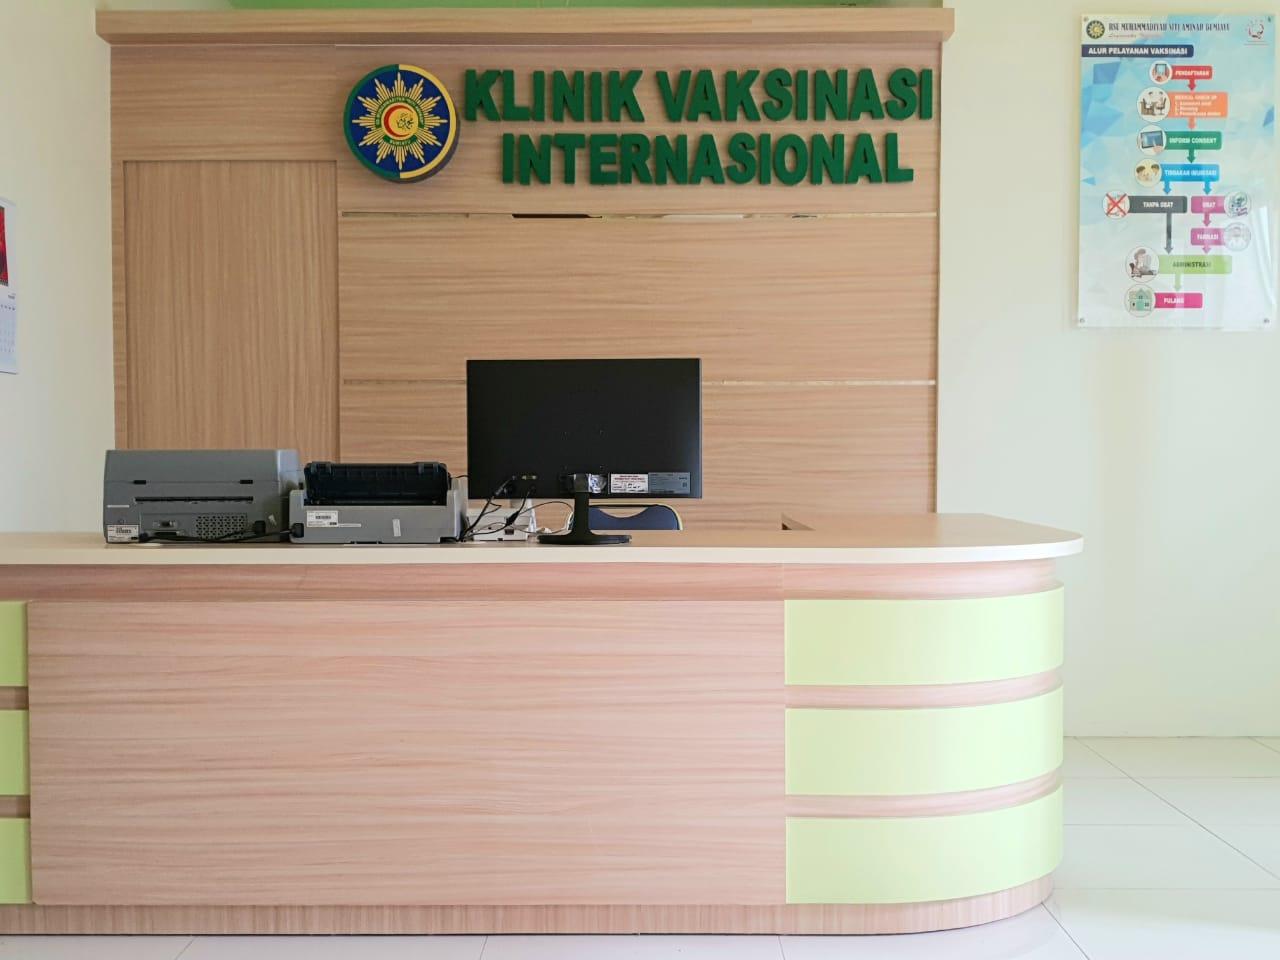 Klinik Vaksinasi Internasional